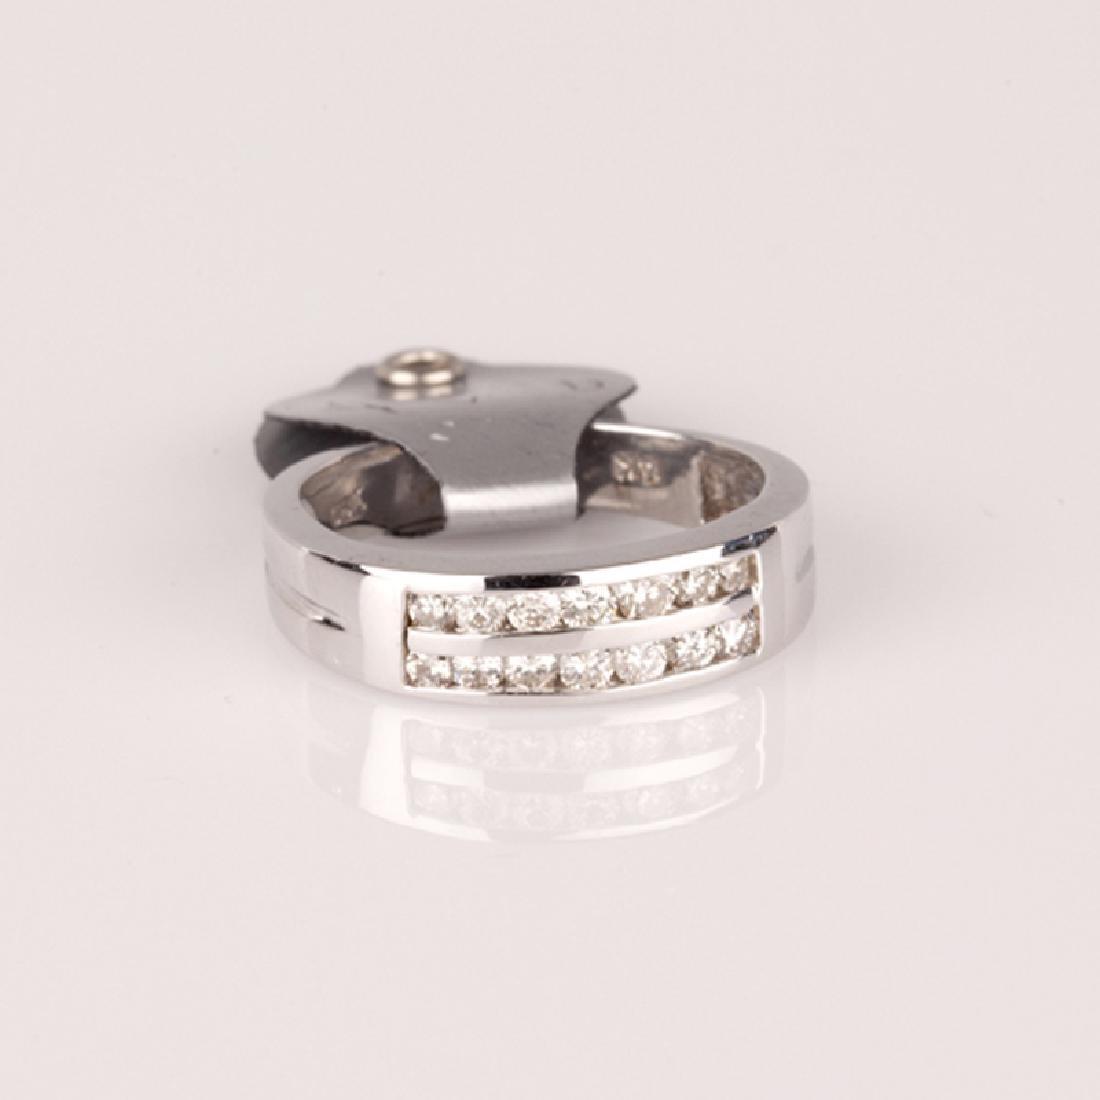 *Fine Jewelry 14 kt. White Gold, New Custom Made,